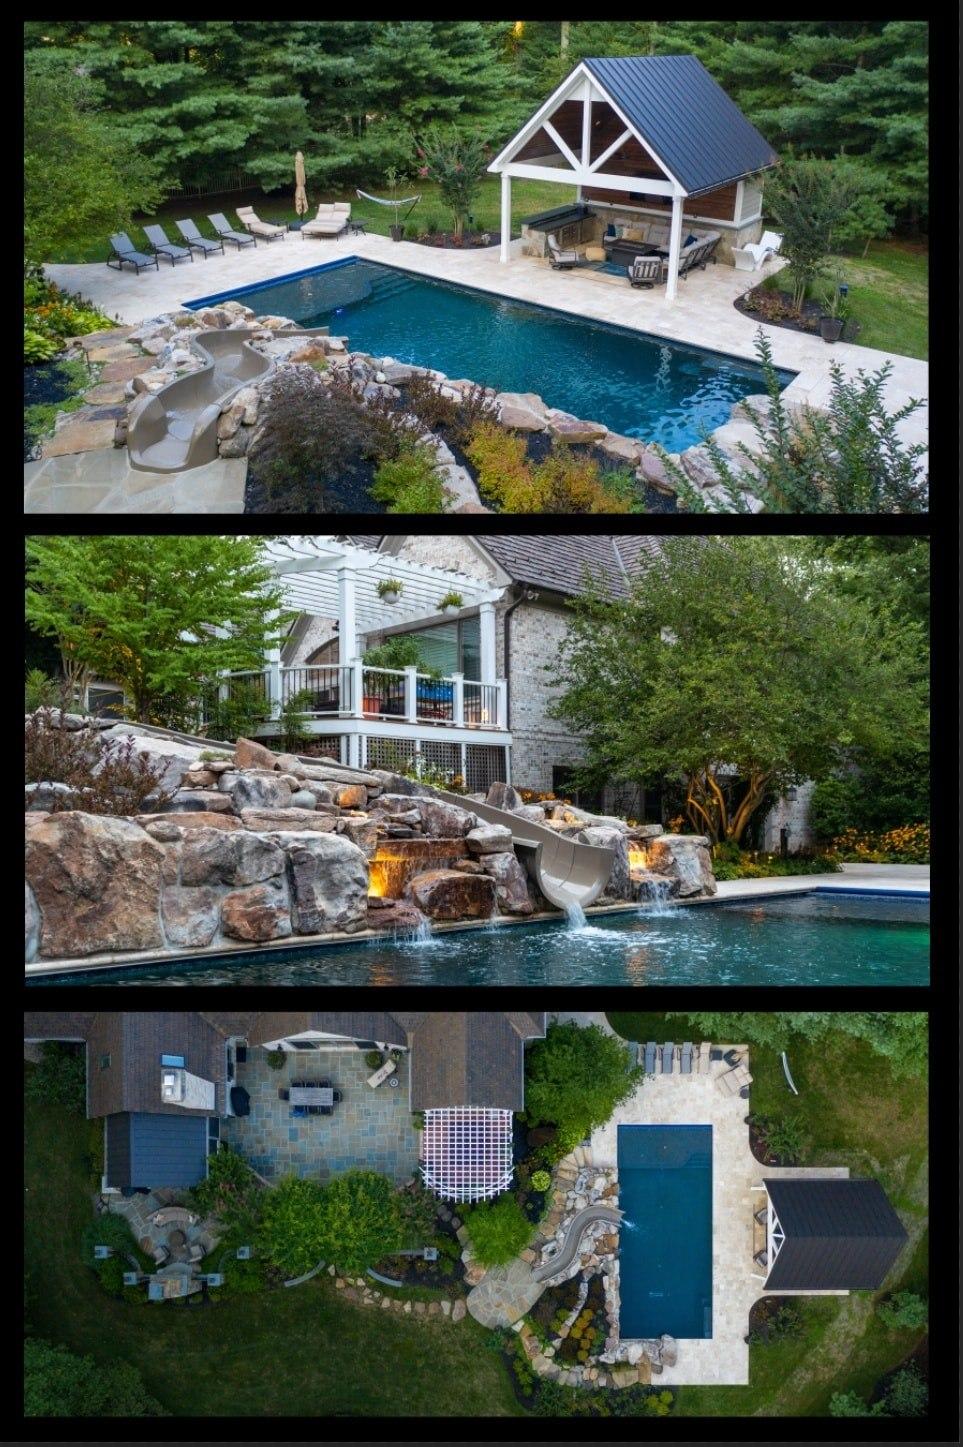 howard county swimming pool, pergola, fireplace